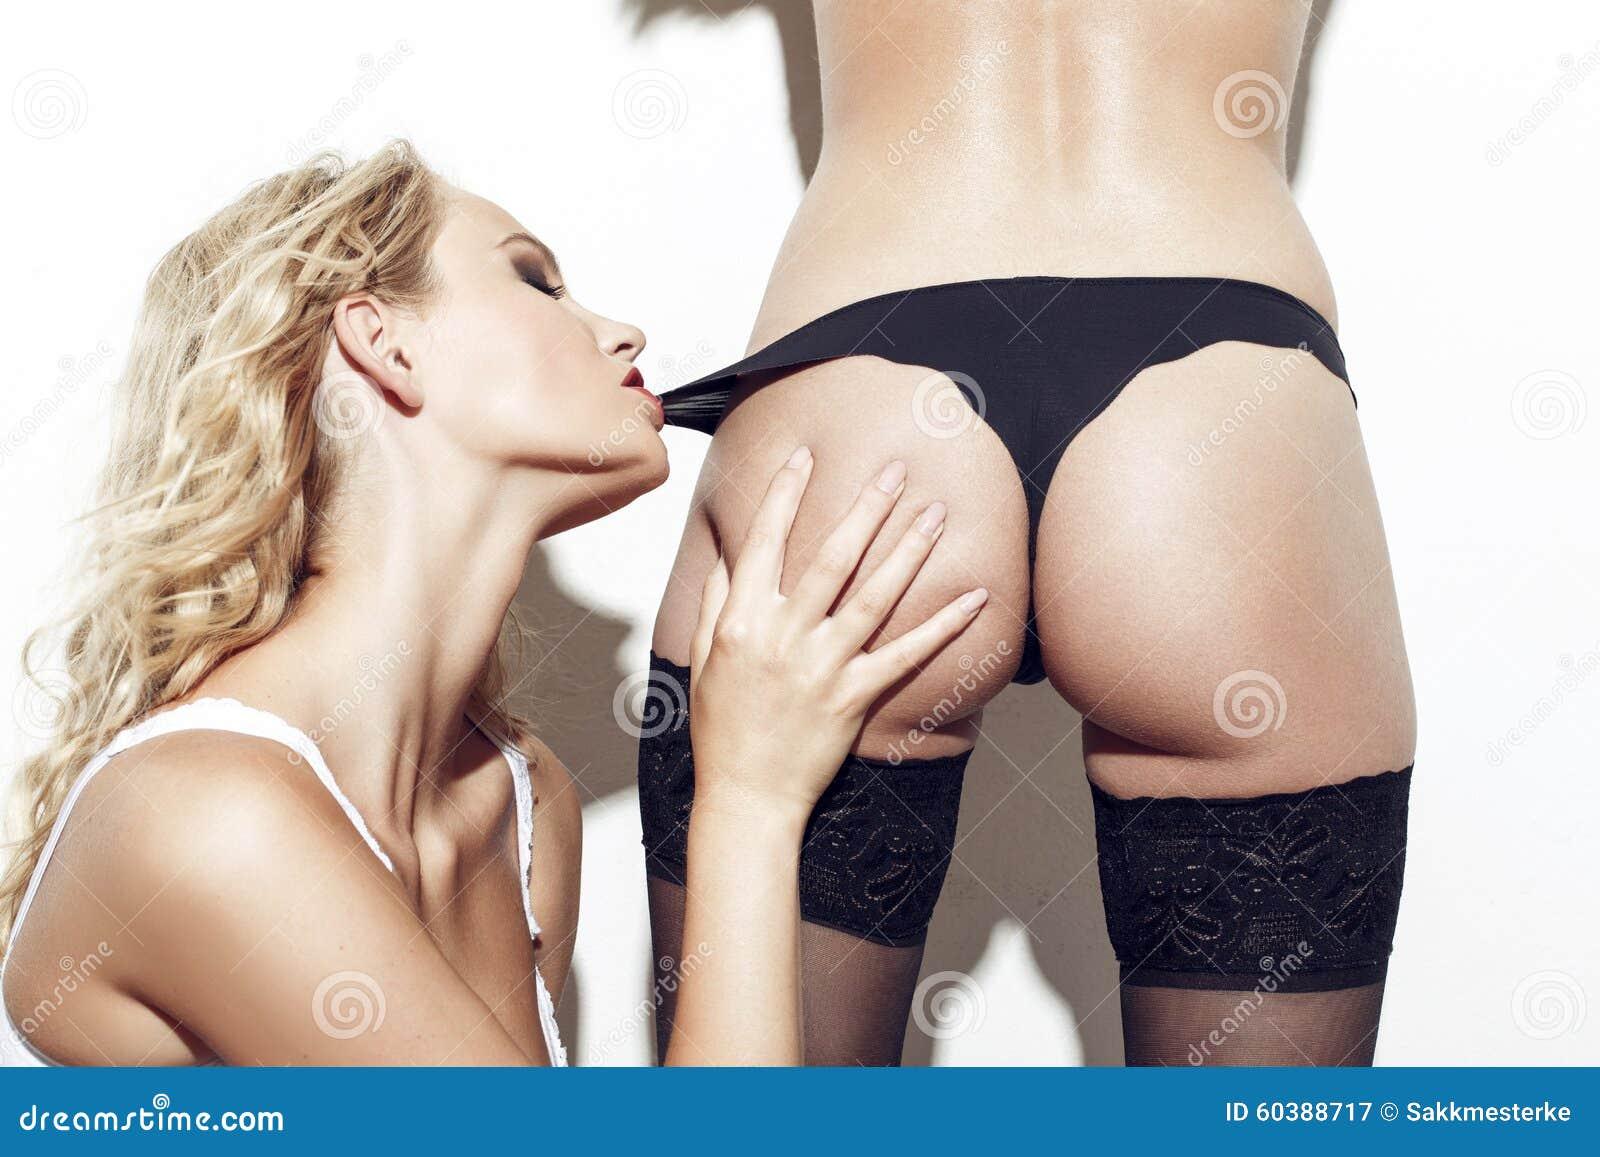 Lesbiche in mutandine pics